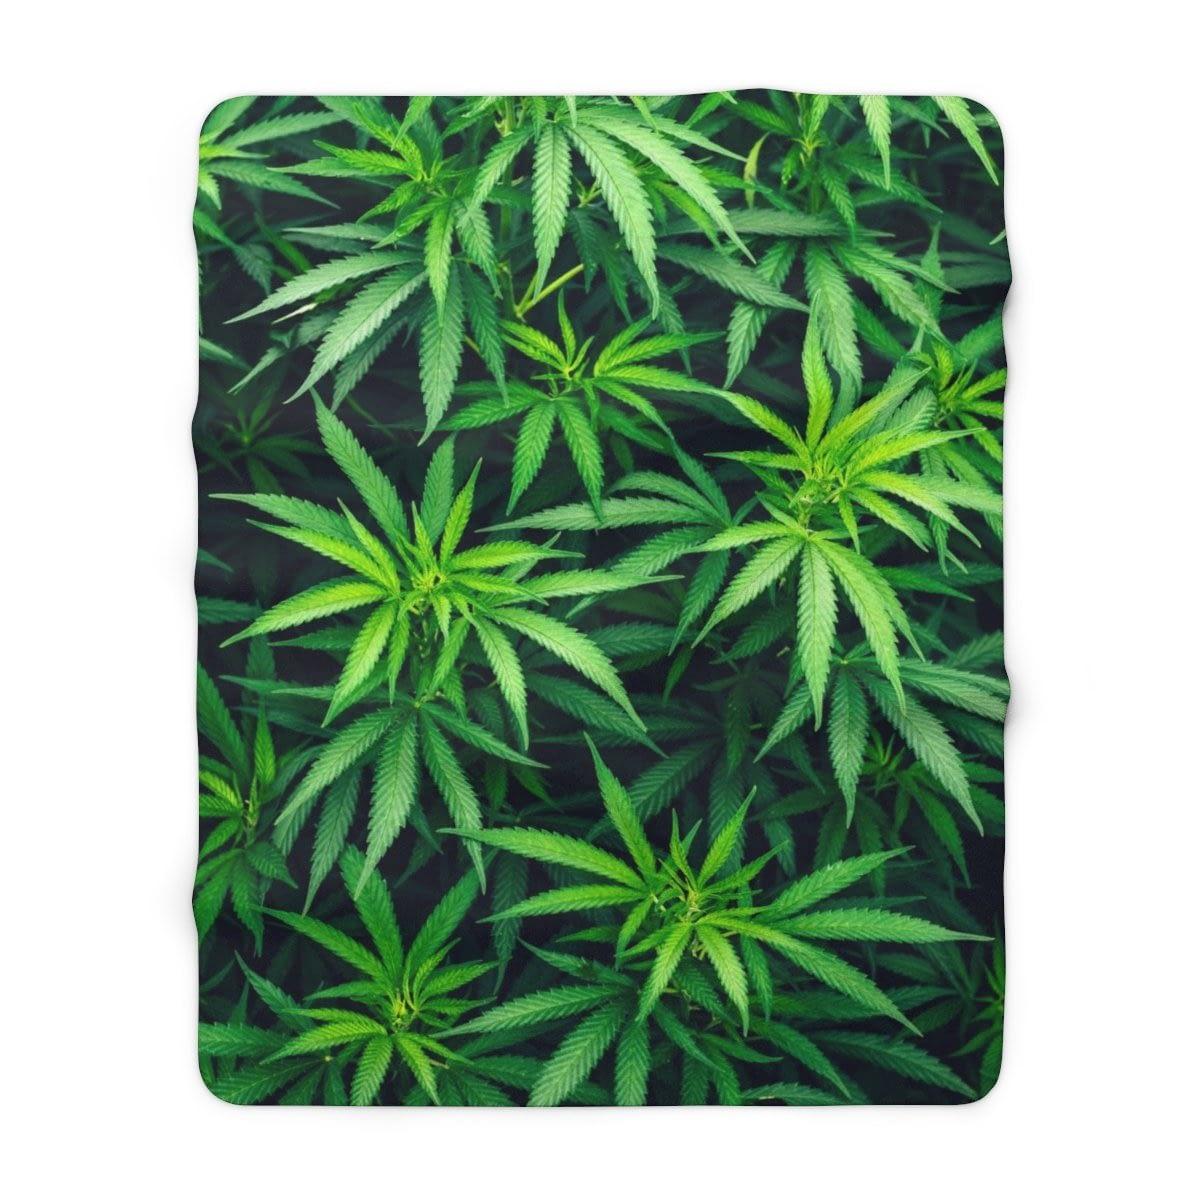 My Cannabis Sherpa Fleece Blanket